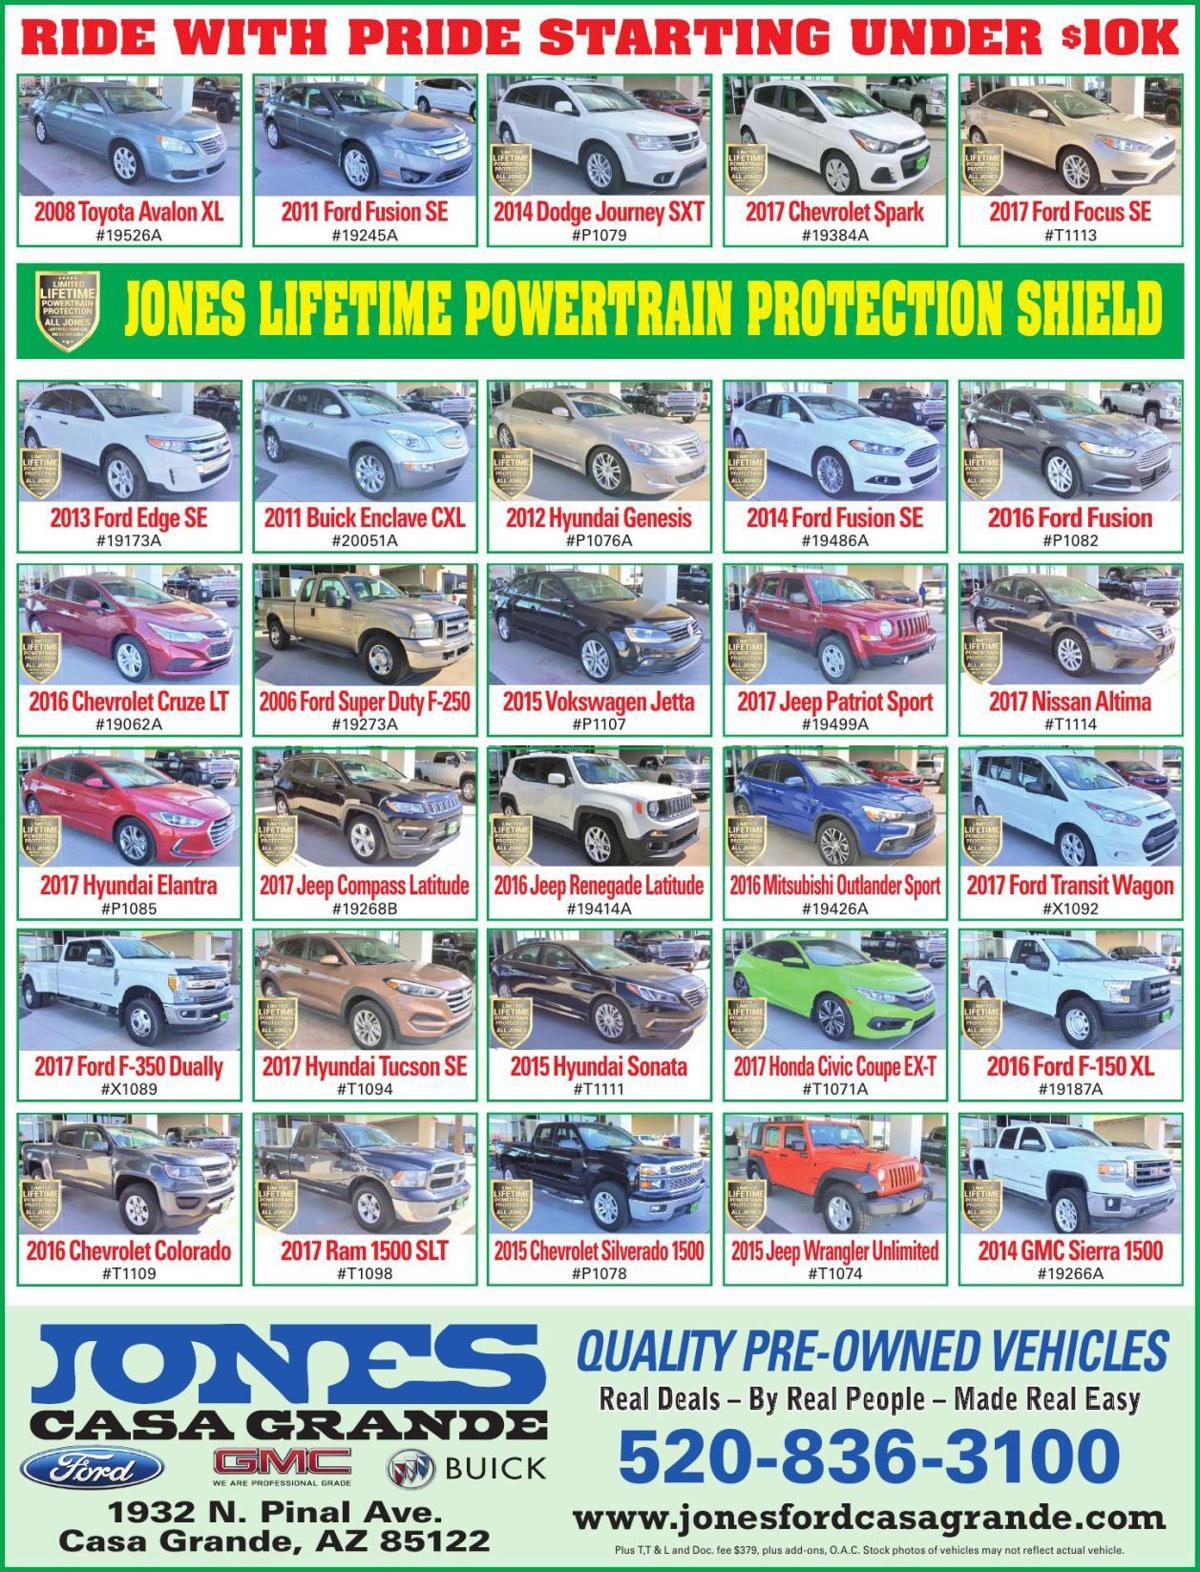 Jones Ford Buick GMC